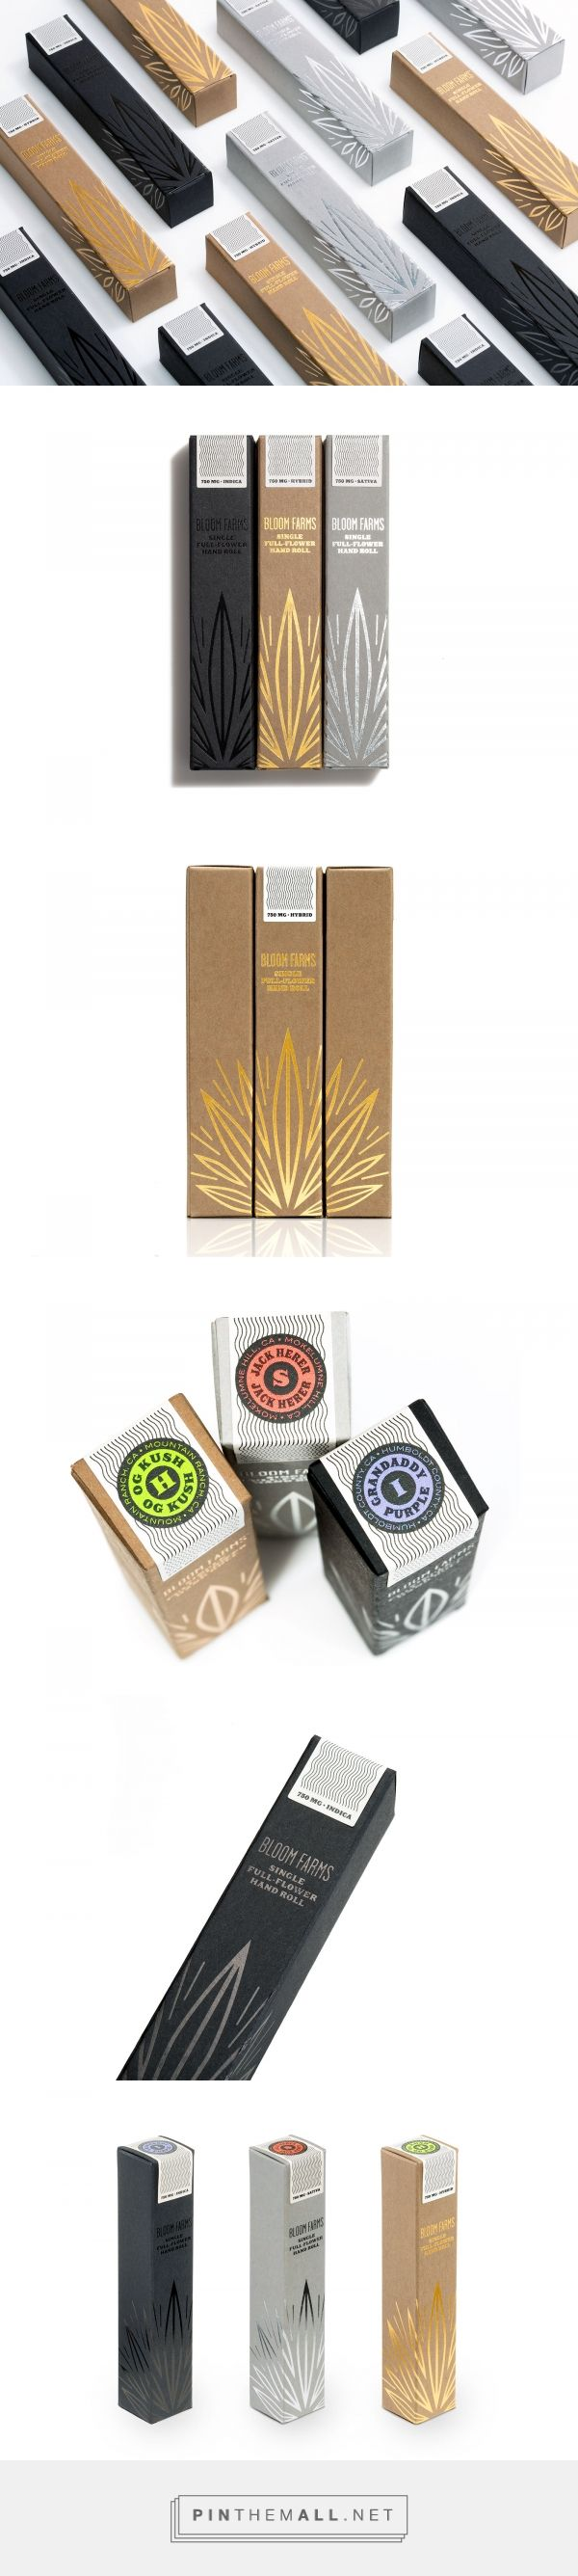 Bloom Farms Premium Hand Rolls packaging design by Pavement - http://www.packagingoftheworld.com/2017/01/bloom-farms-premium-hand-rolls.html